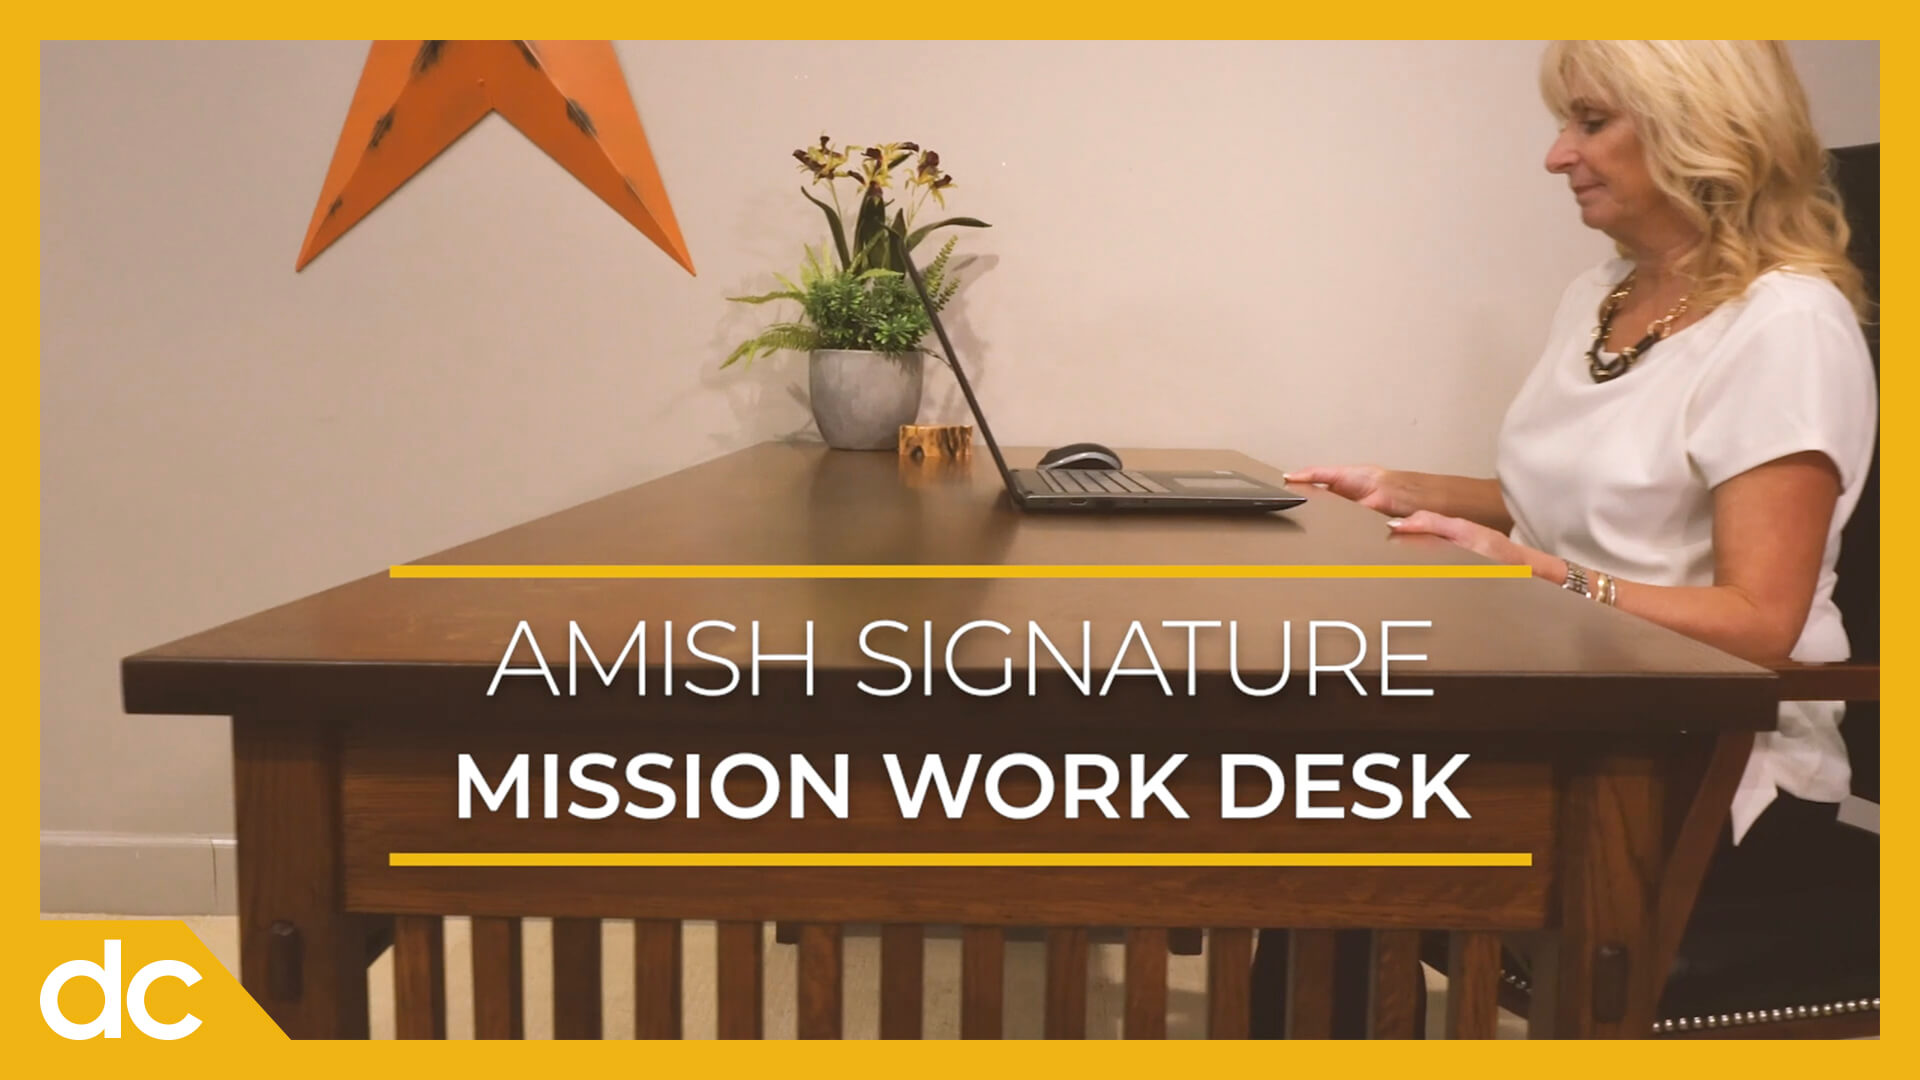 Video Title Image: Amish Signature Mission Work Desk